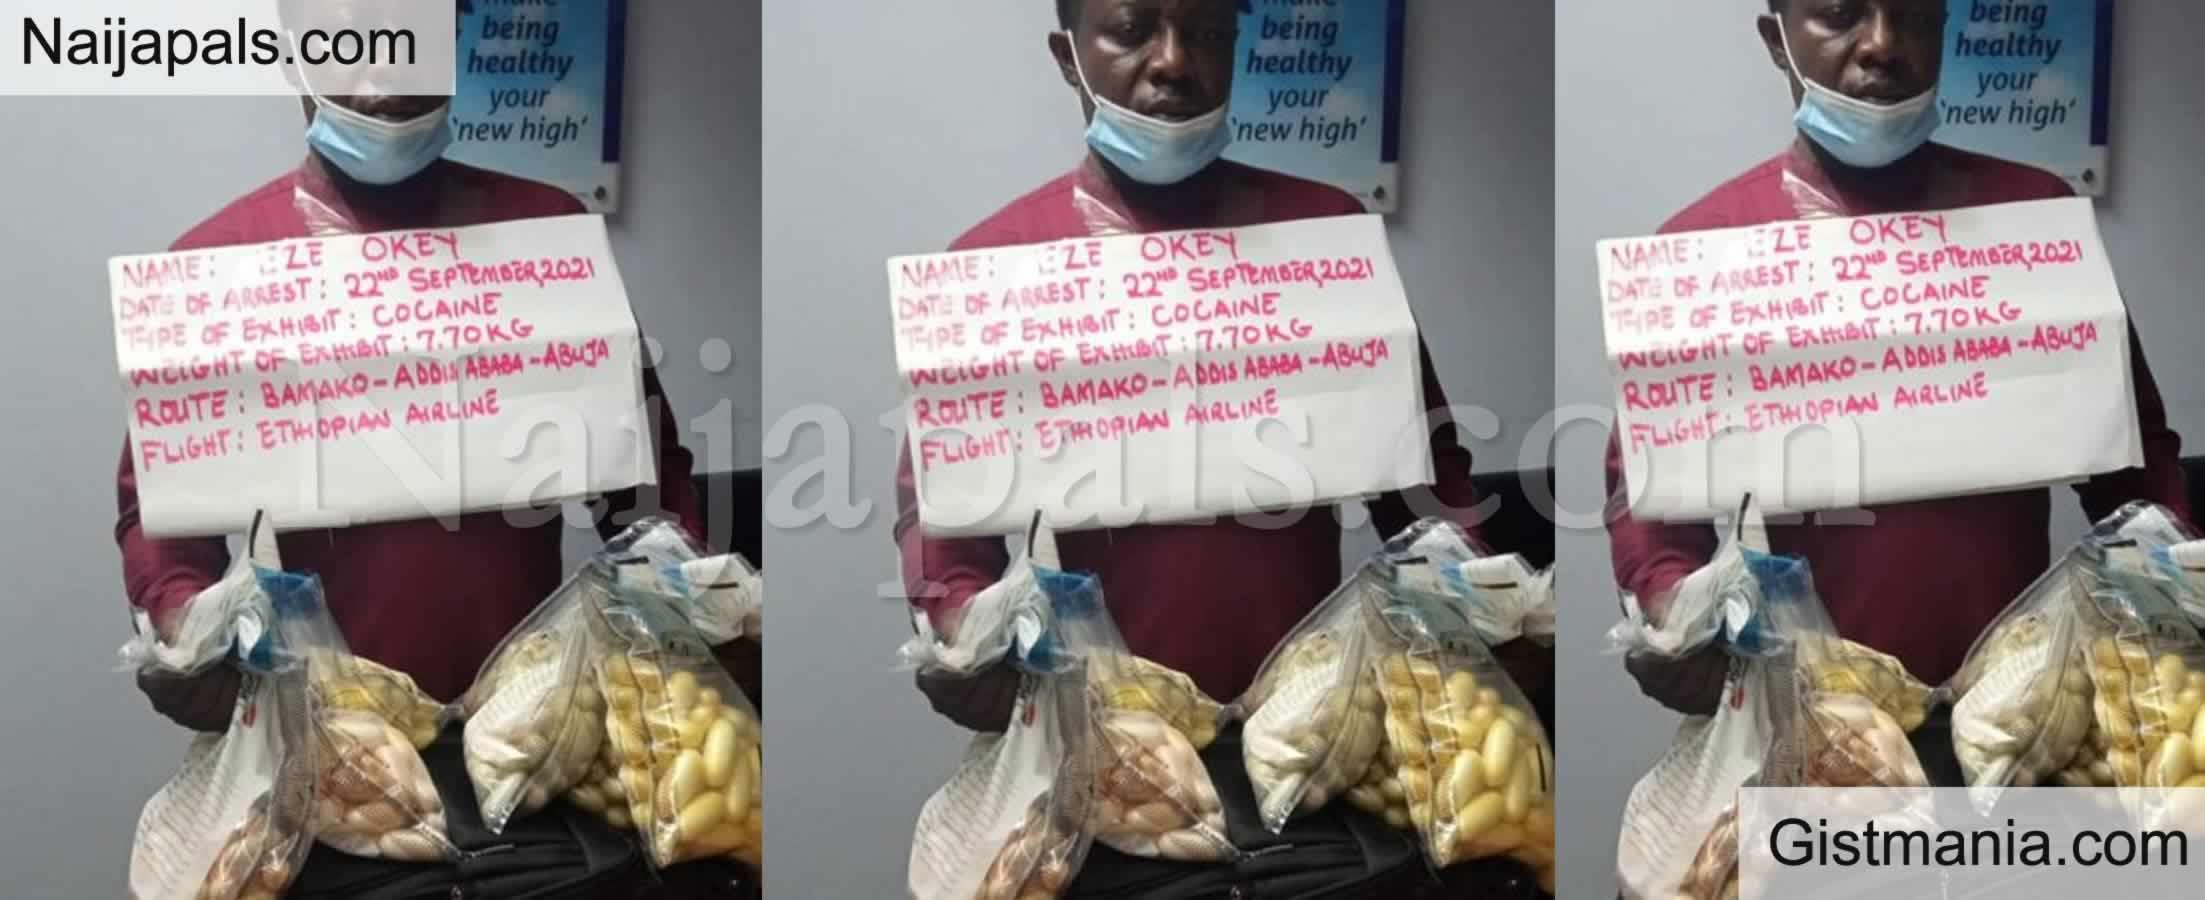 <img alt='.' class='lazyload' data-src='https://img.gistmania.com/emot/comment.gif' /> <b>NDLEA Burst Nigerian Drug Trafficker, Okey Eze With 350 Wraps Of Cocaine Worth N2,3B In Abuja</b>